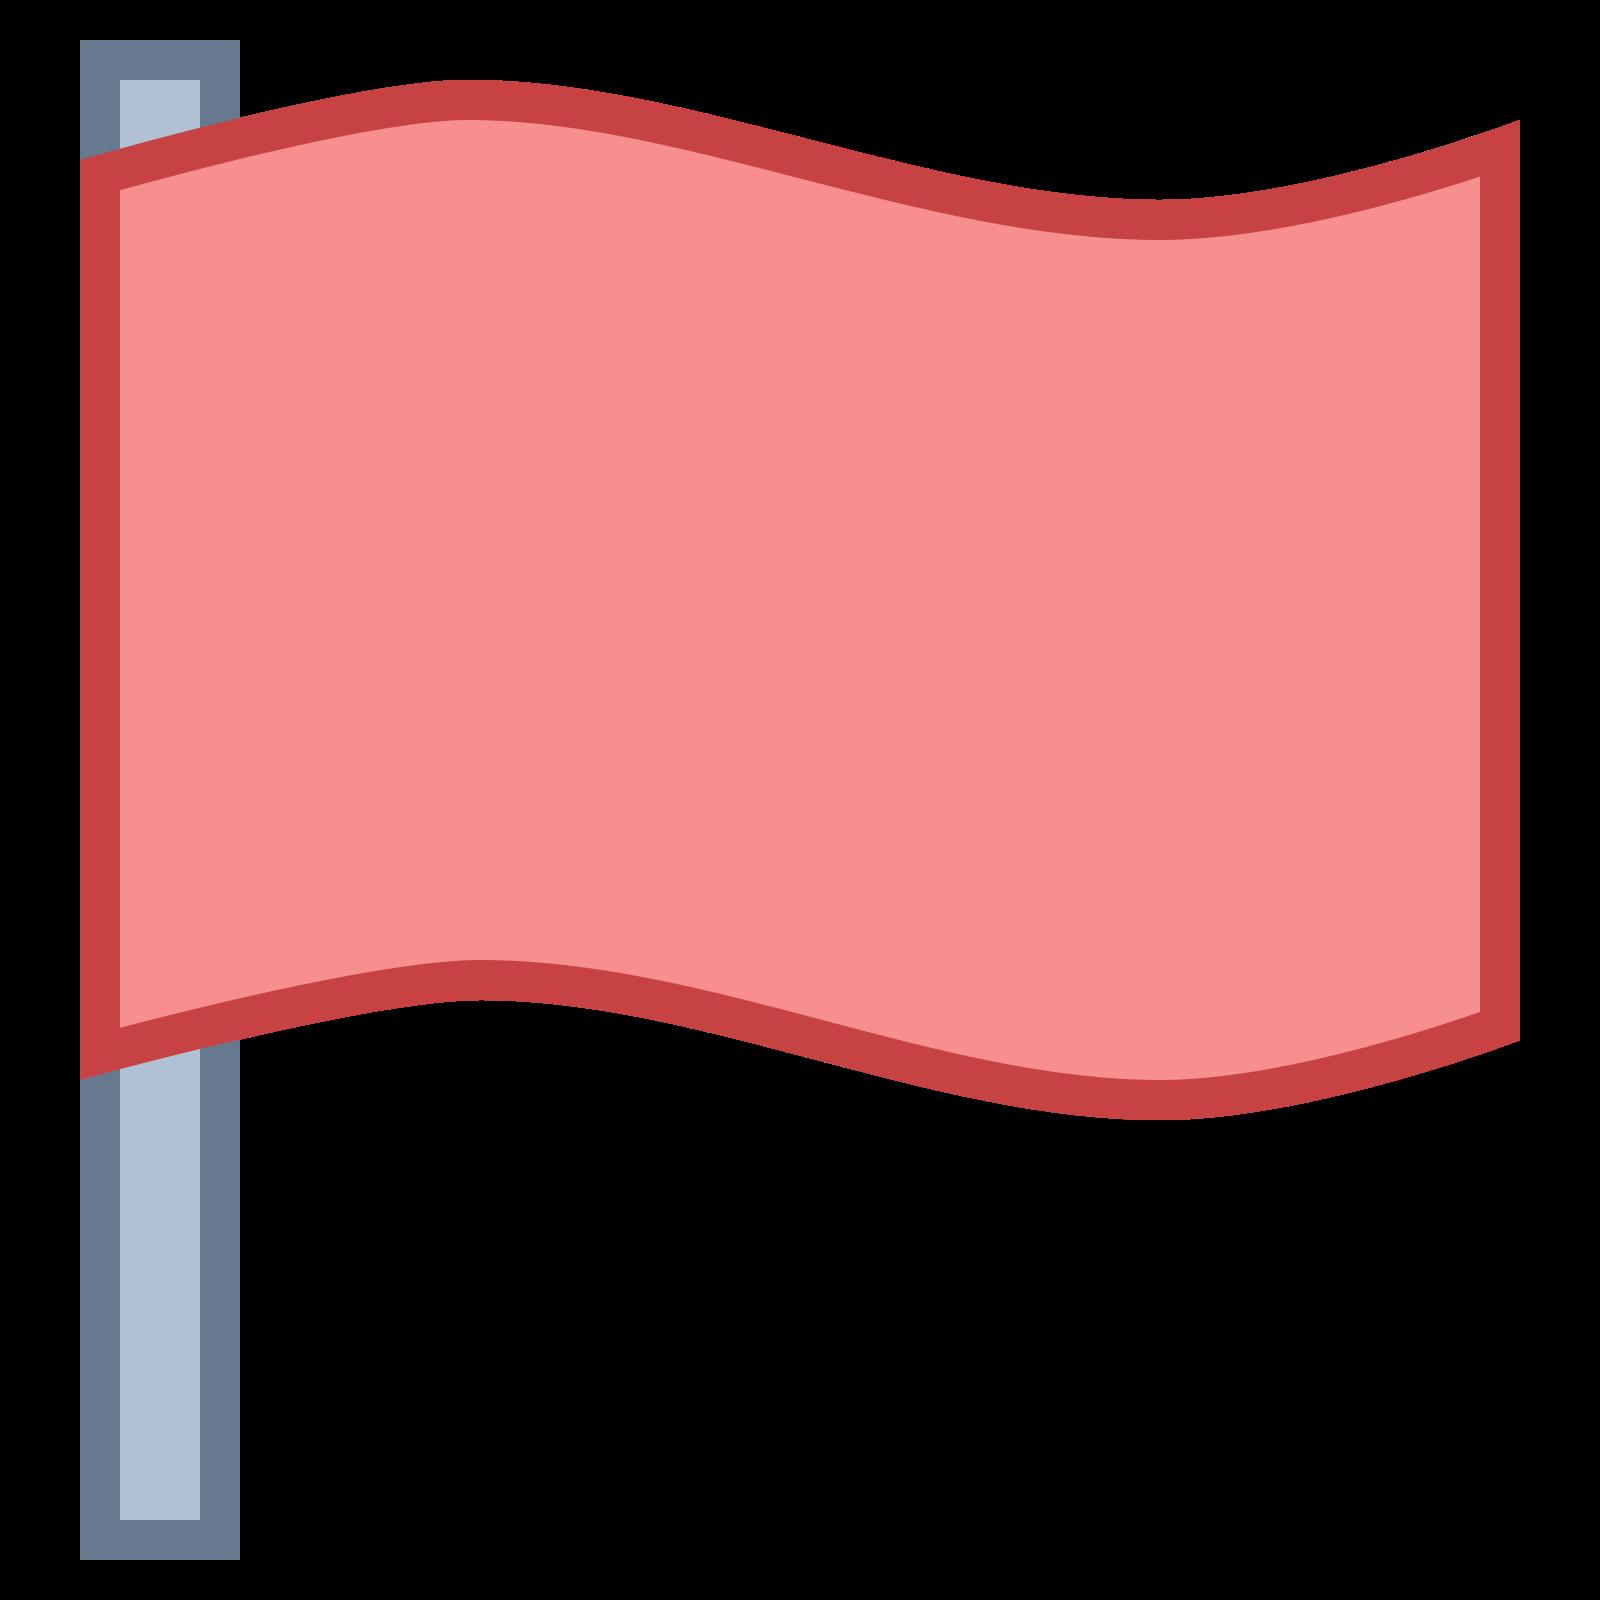 Wypełniona Flaga 2 icon